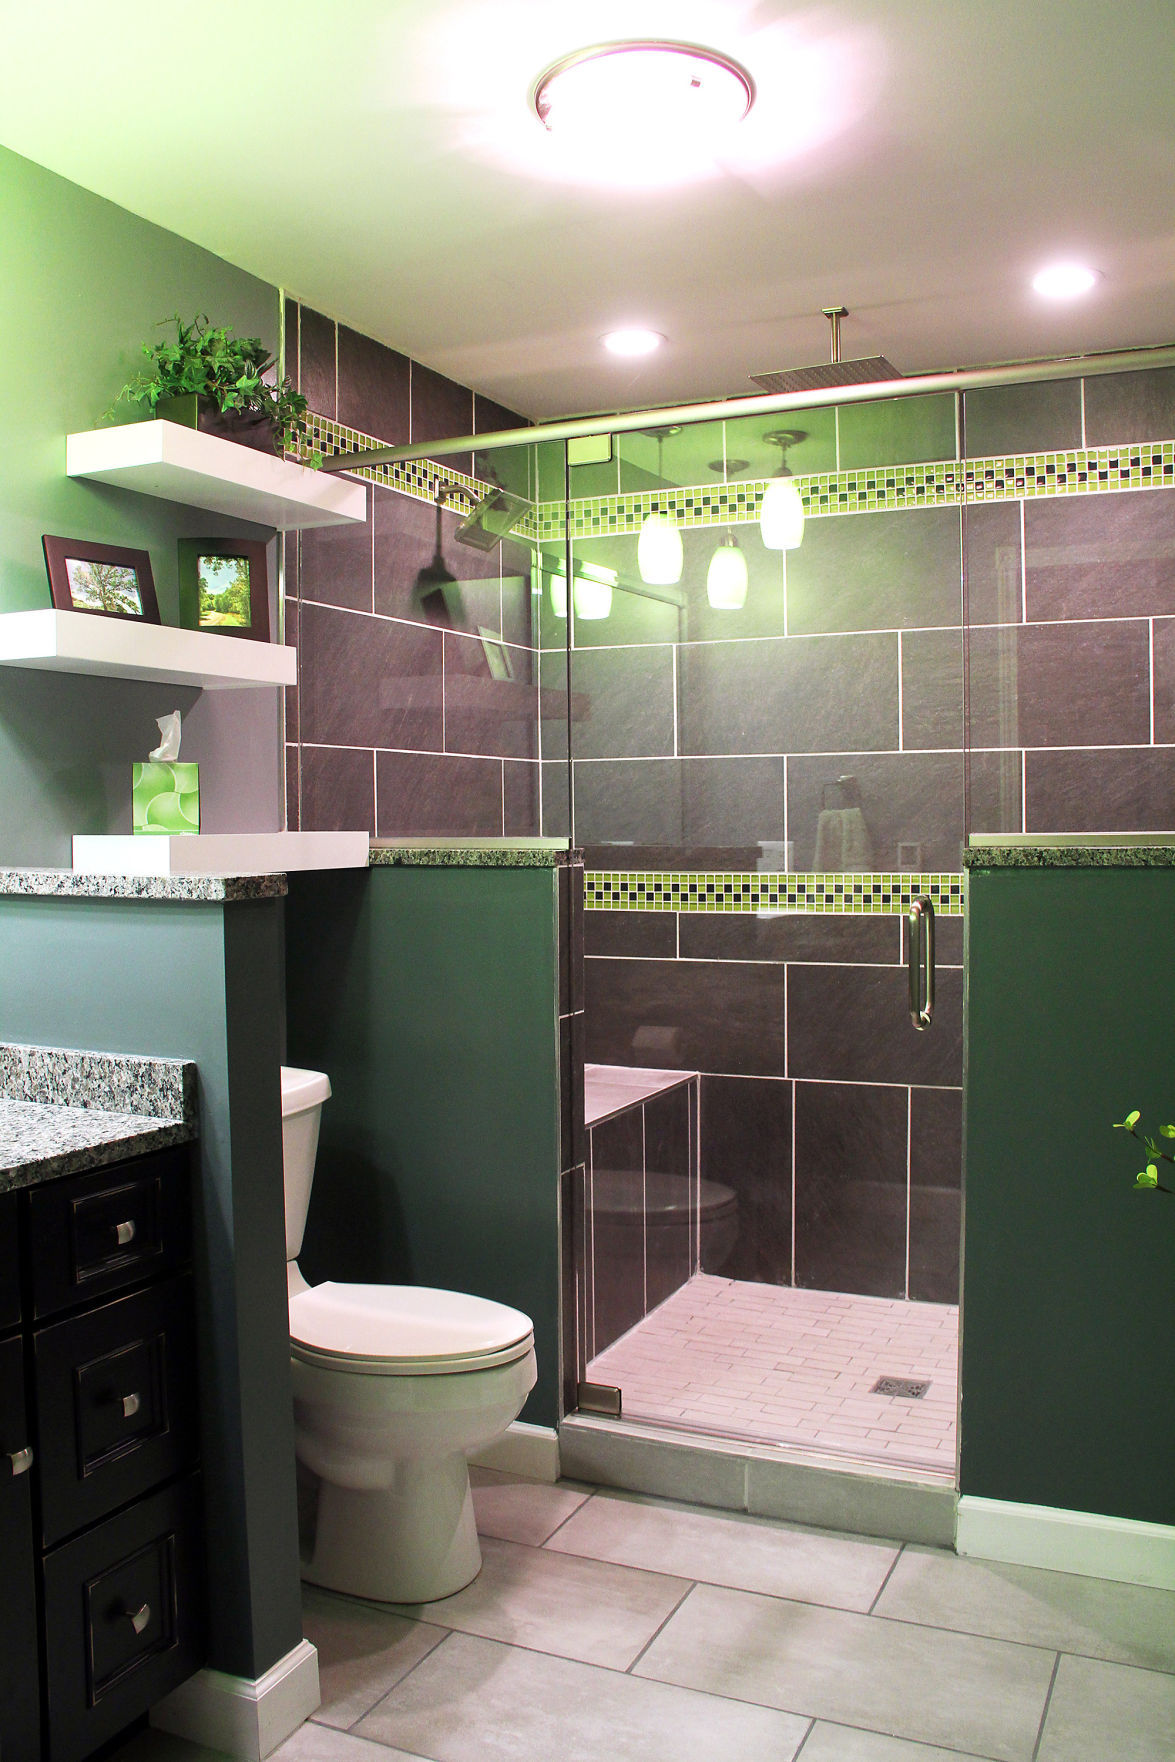 Green S My Favorite Color Lifestyles Qctimes Com